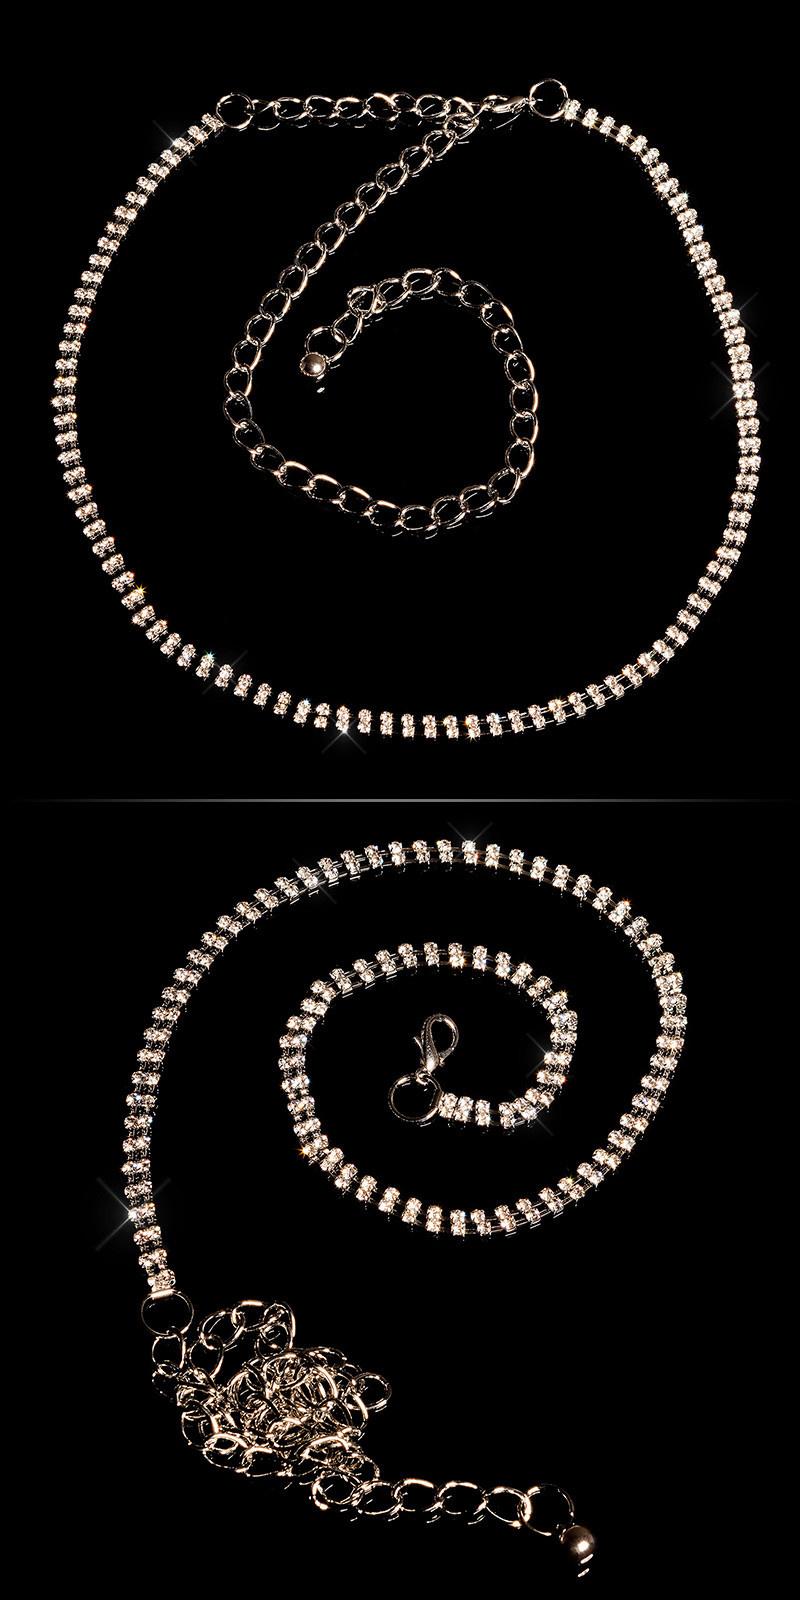 Trendy ketting riem zilver